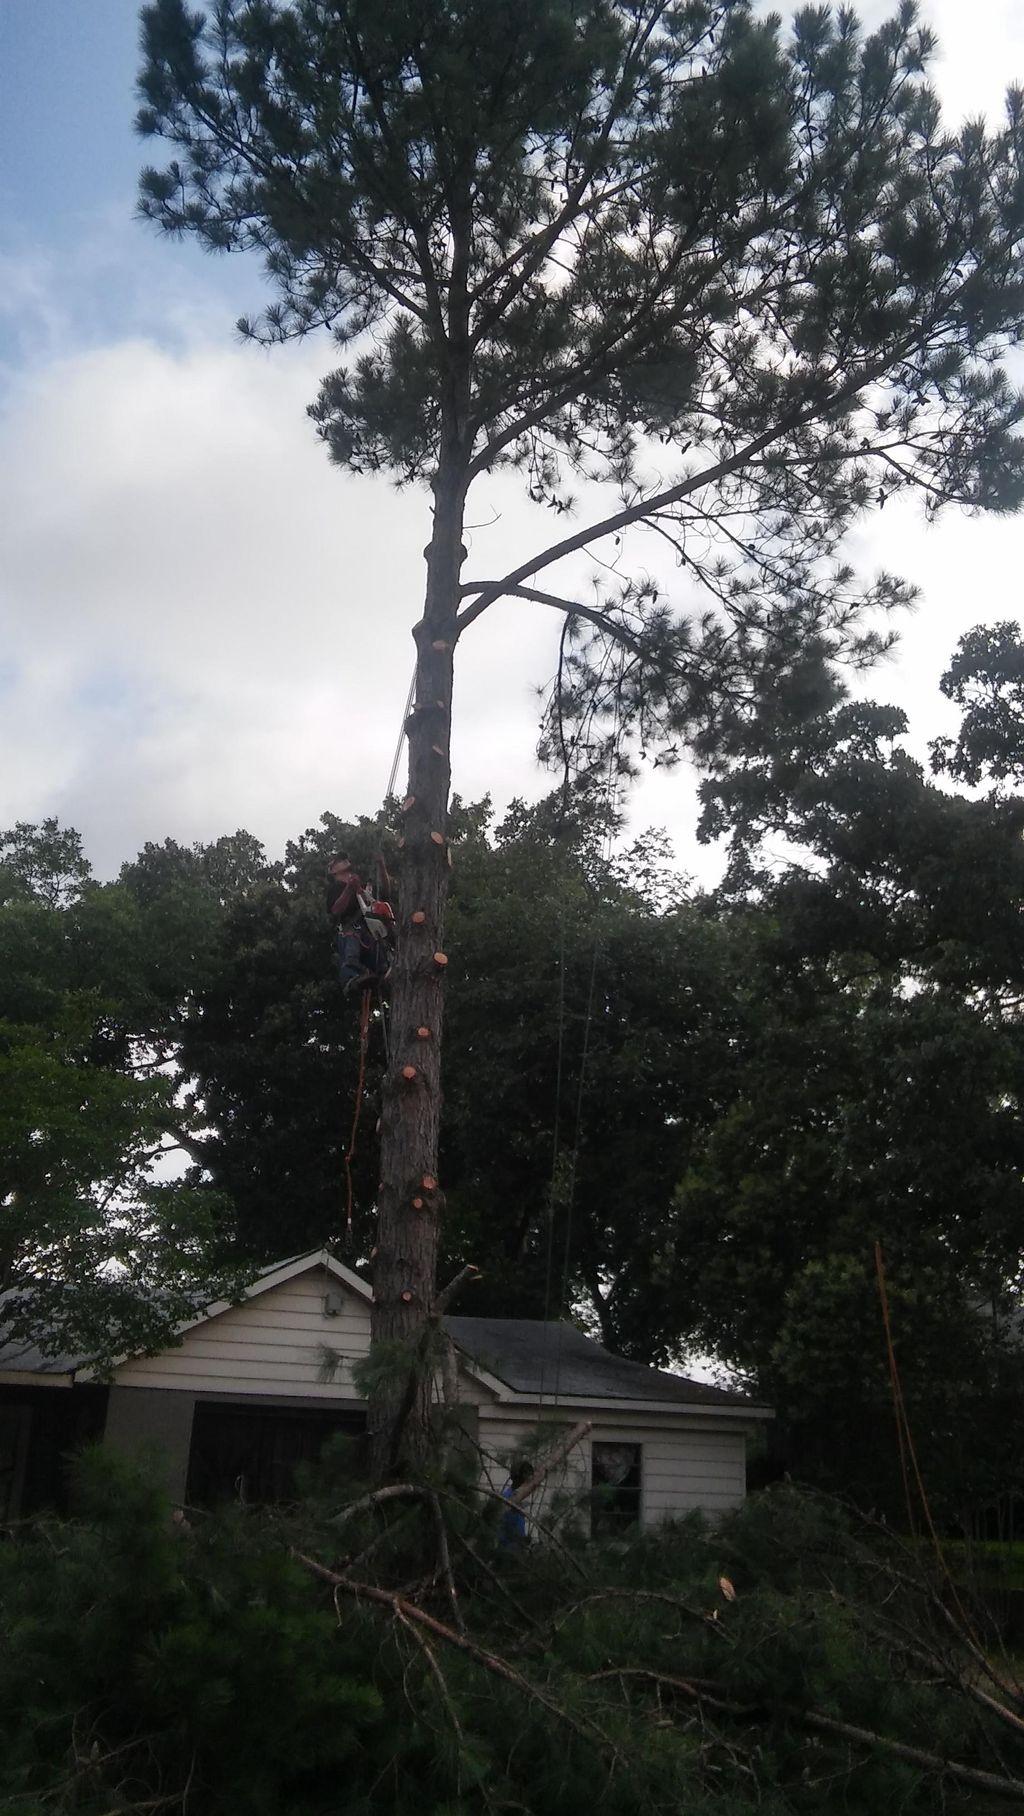 PapaLewis Tree & Lawn Service